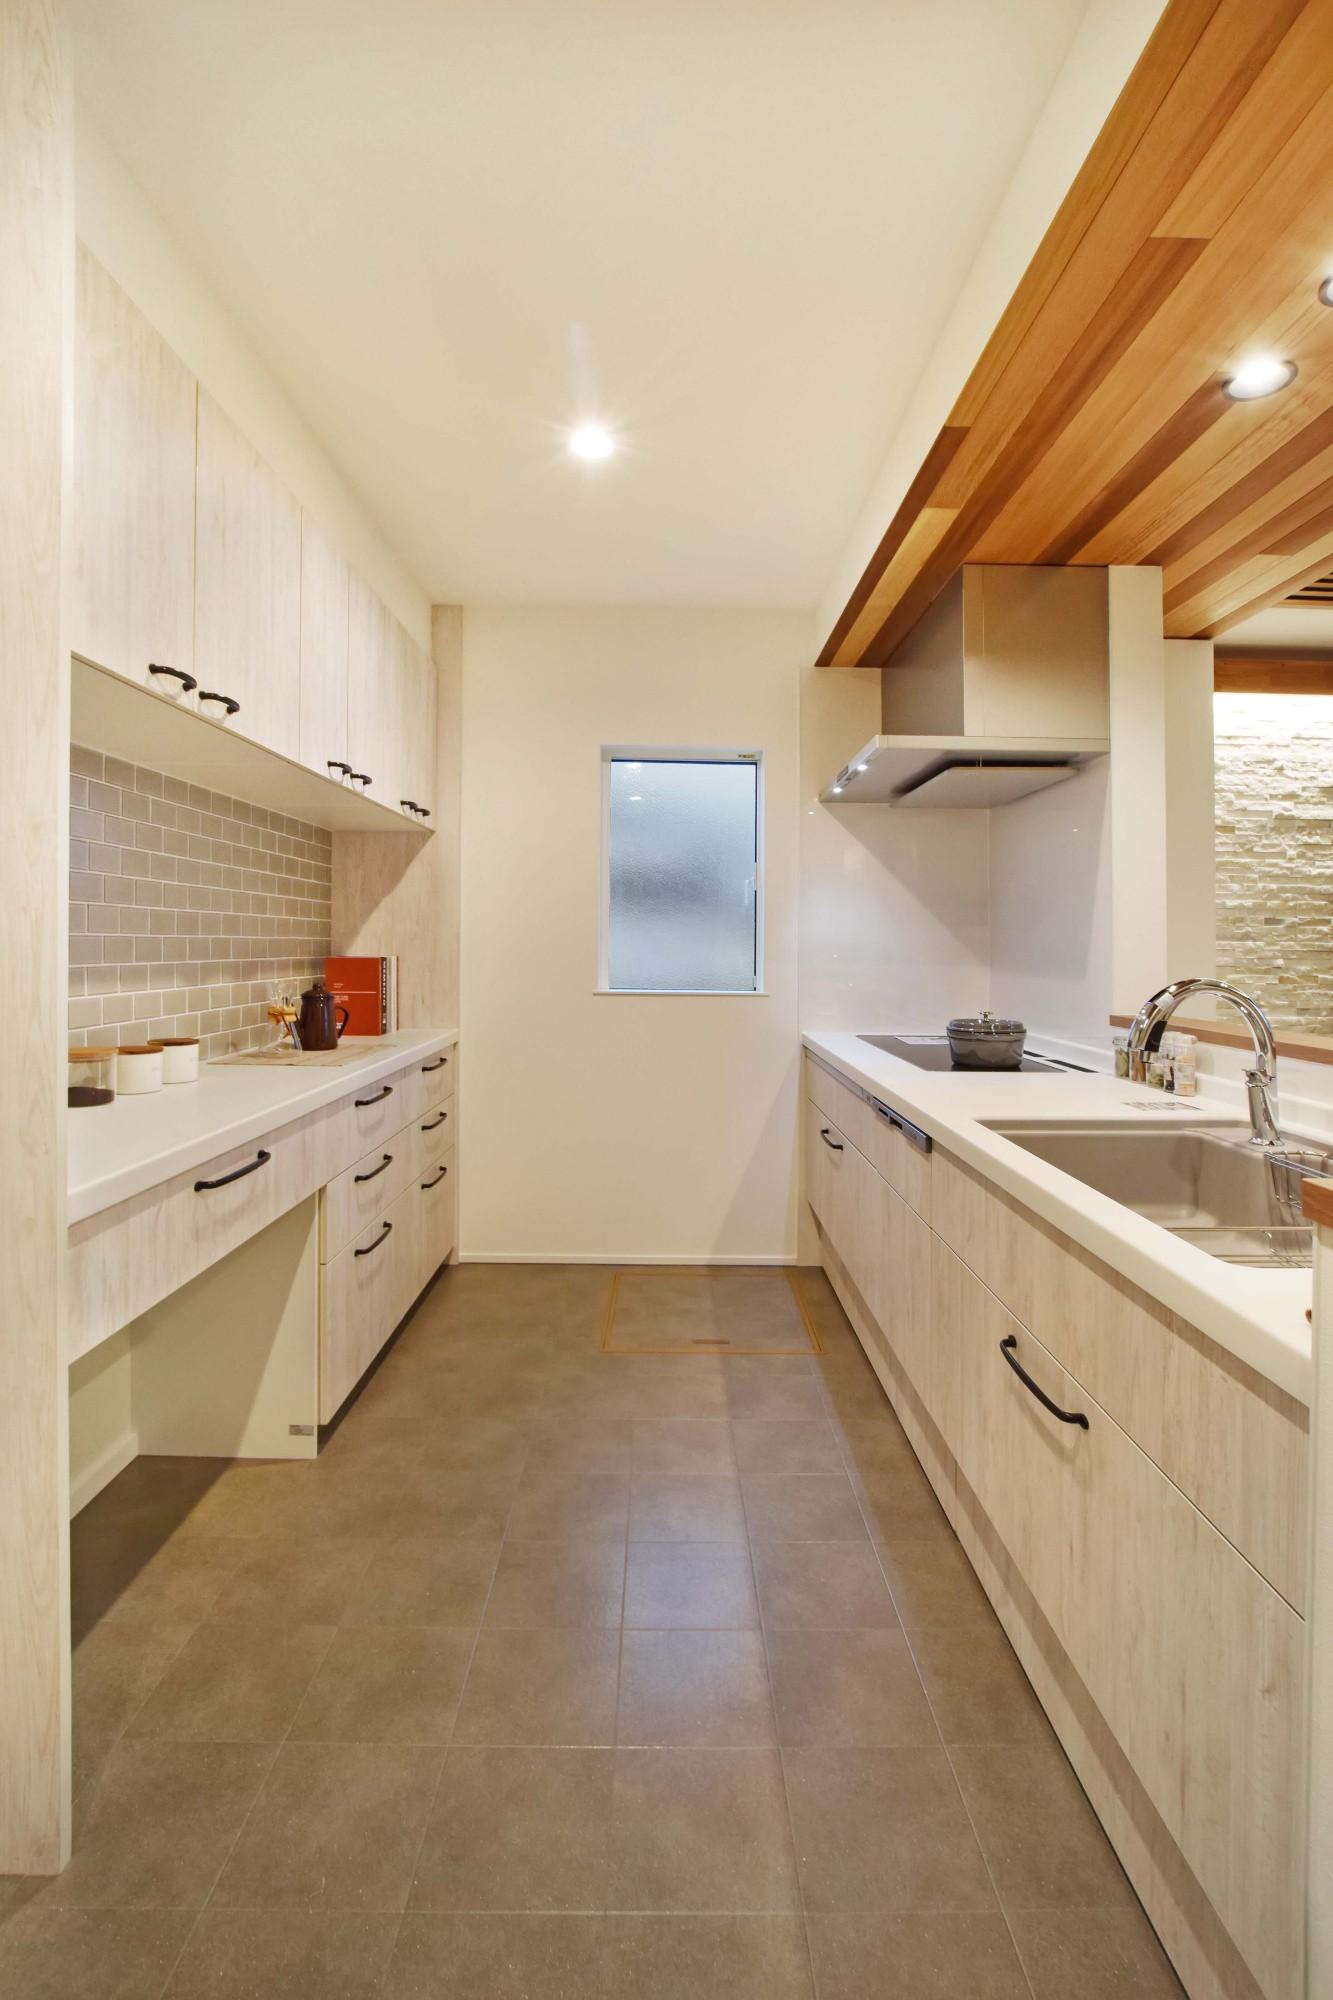 DETAIL HOME(ディテールホーム)「和と洋の溶け合う心地いい暮らし」の和風・和モダンなキッチンの実例写真